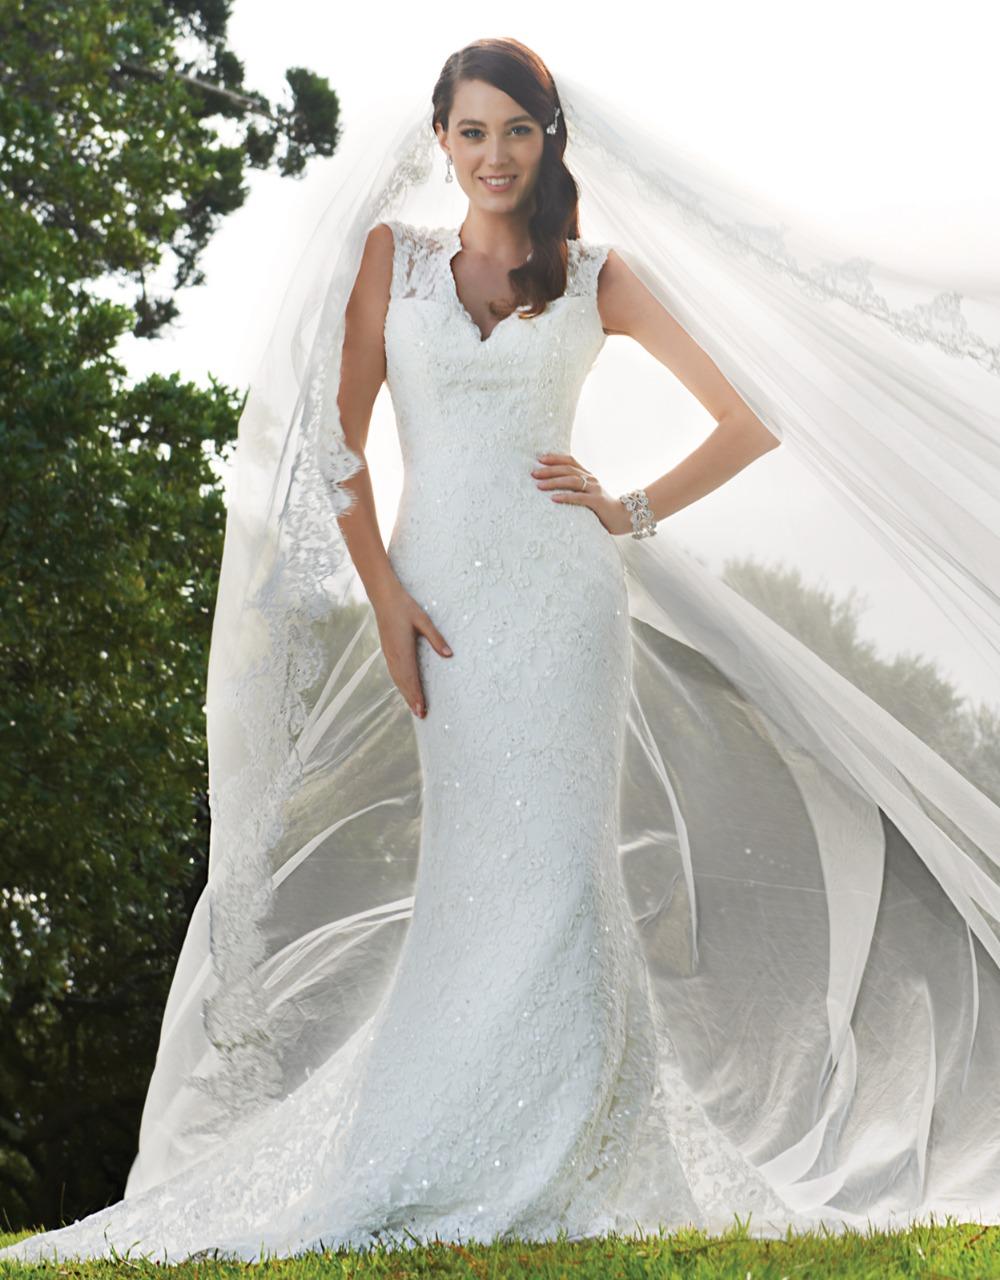 Vestidos de novia 2016 2015 v neck lace country style for Country style lace wedding dress